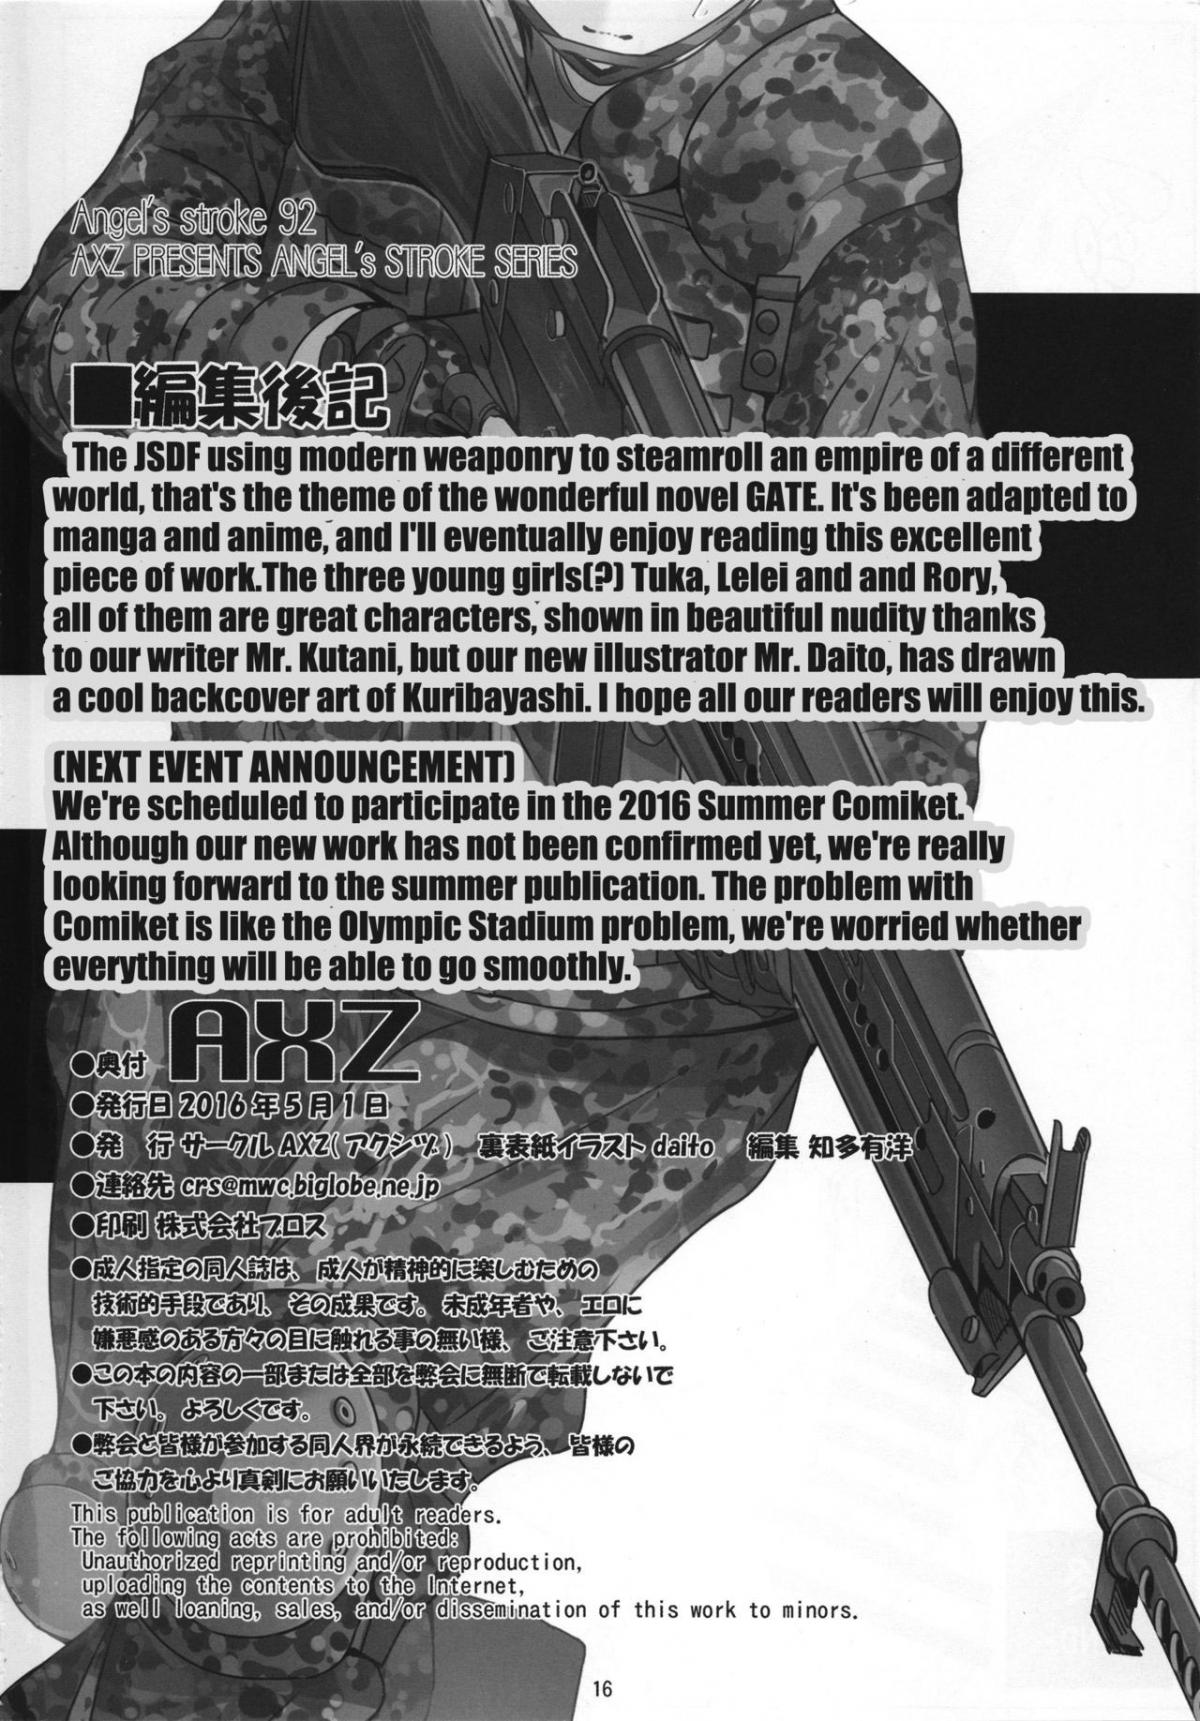 HentaiVN.net - Ảnh 18 - Angels stroke 92 G2 (Gate: Jieitai Kano Chi nite, Kaku Tatakaeri) - Oneshot